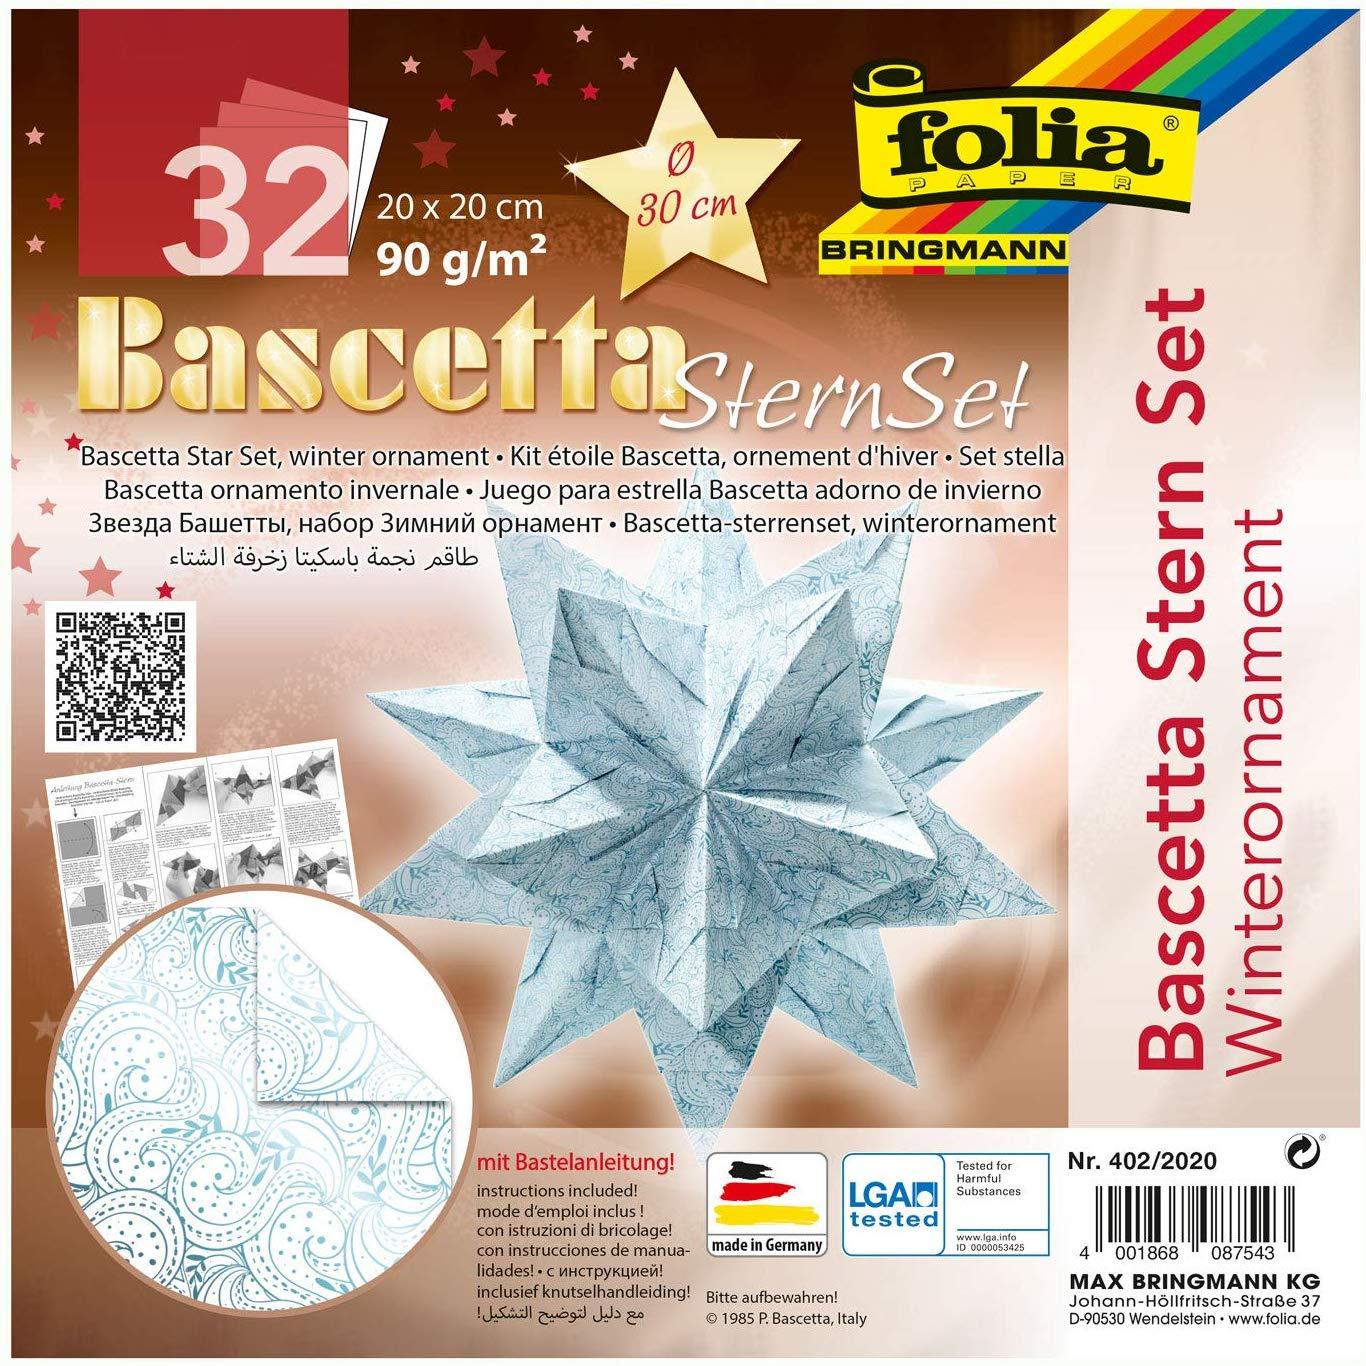 folia 402/2020 - Bastelset Bascetta Stern Winterornament weiß/eisblau, 32 Blatt, 20 x 20 cm, fertige